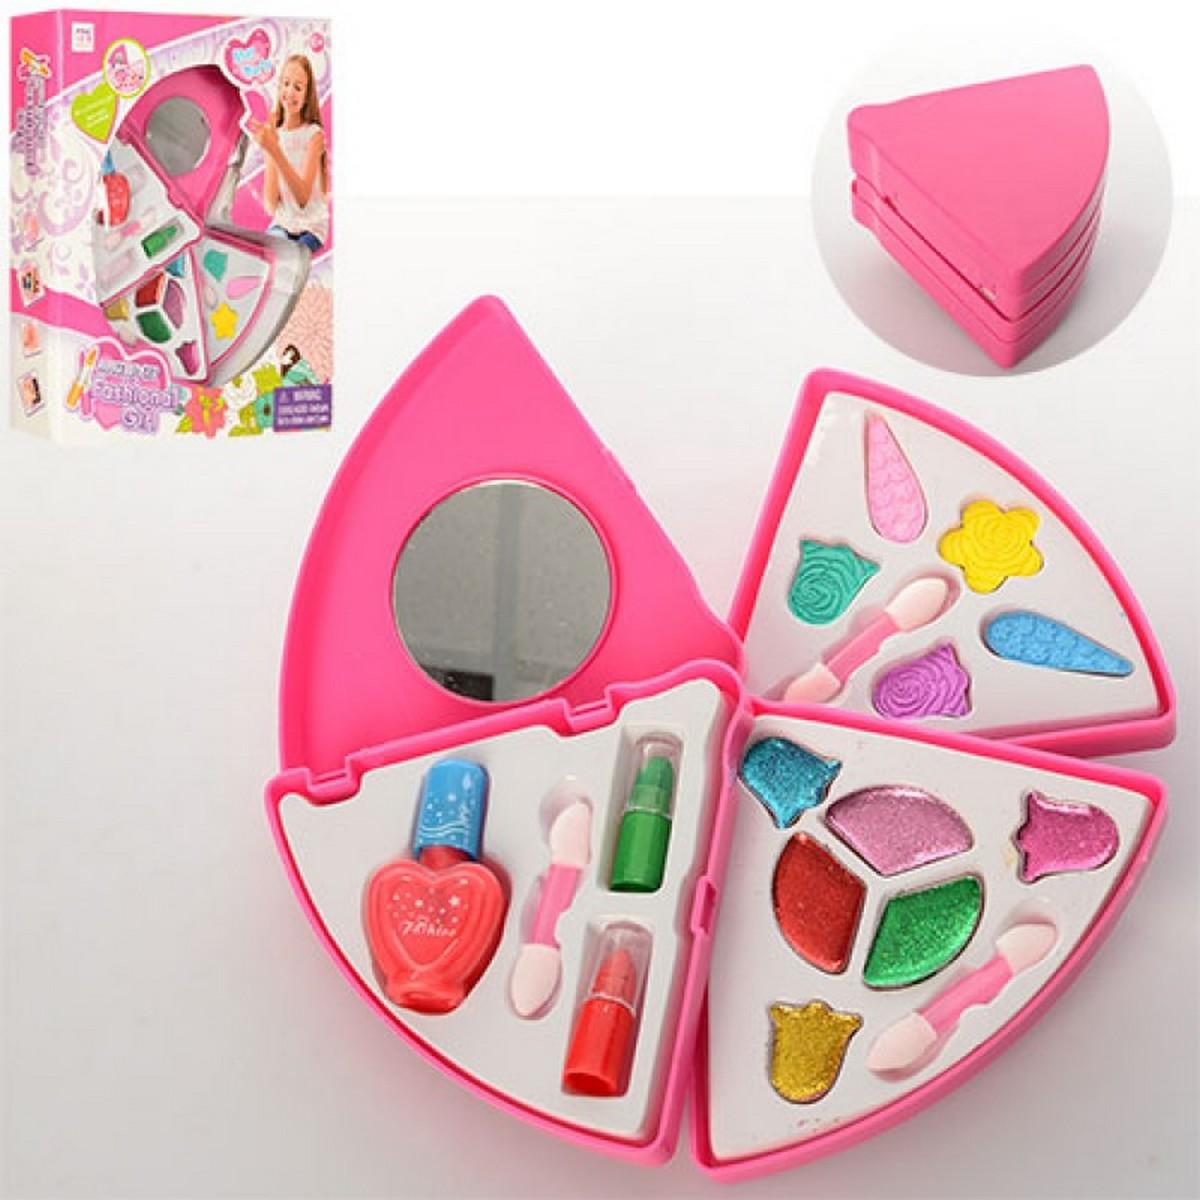 bk toys Косметика для девочек 3-х ярусная CM118-9A